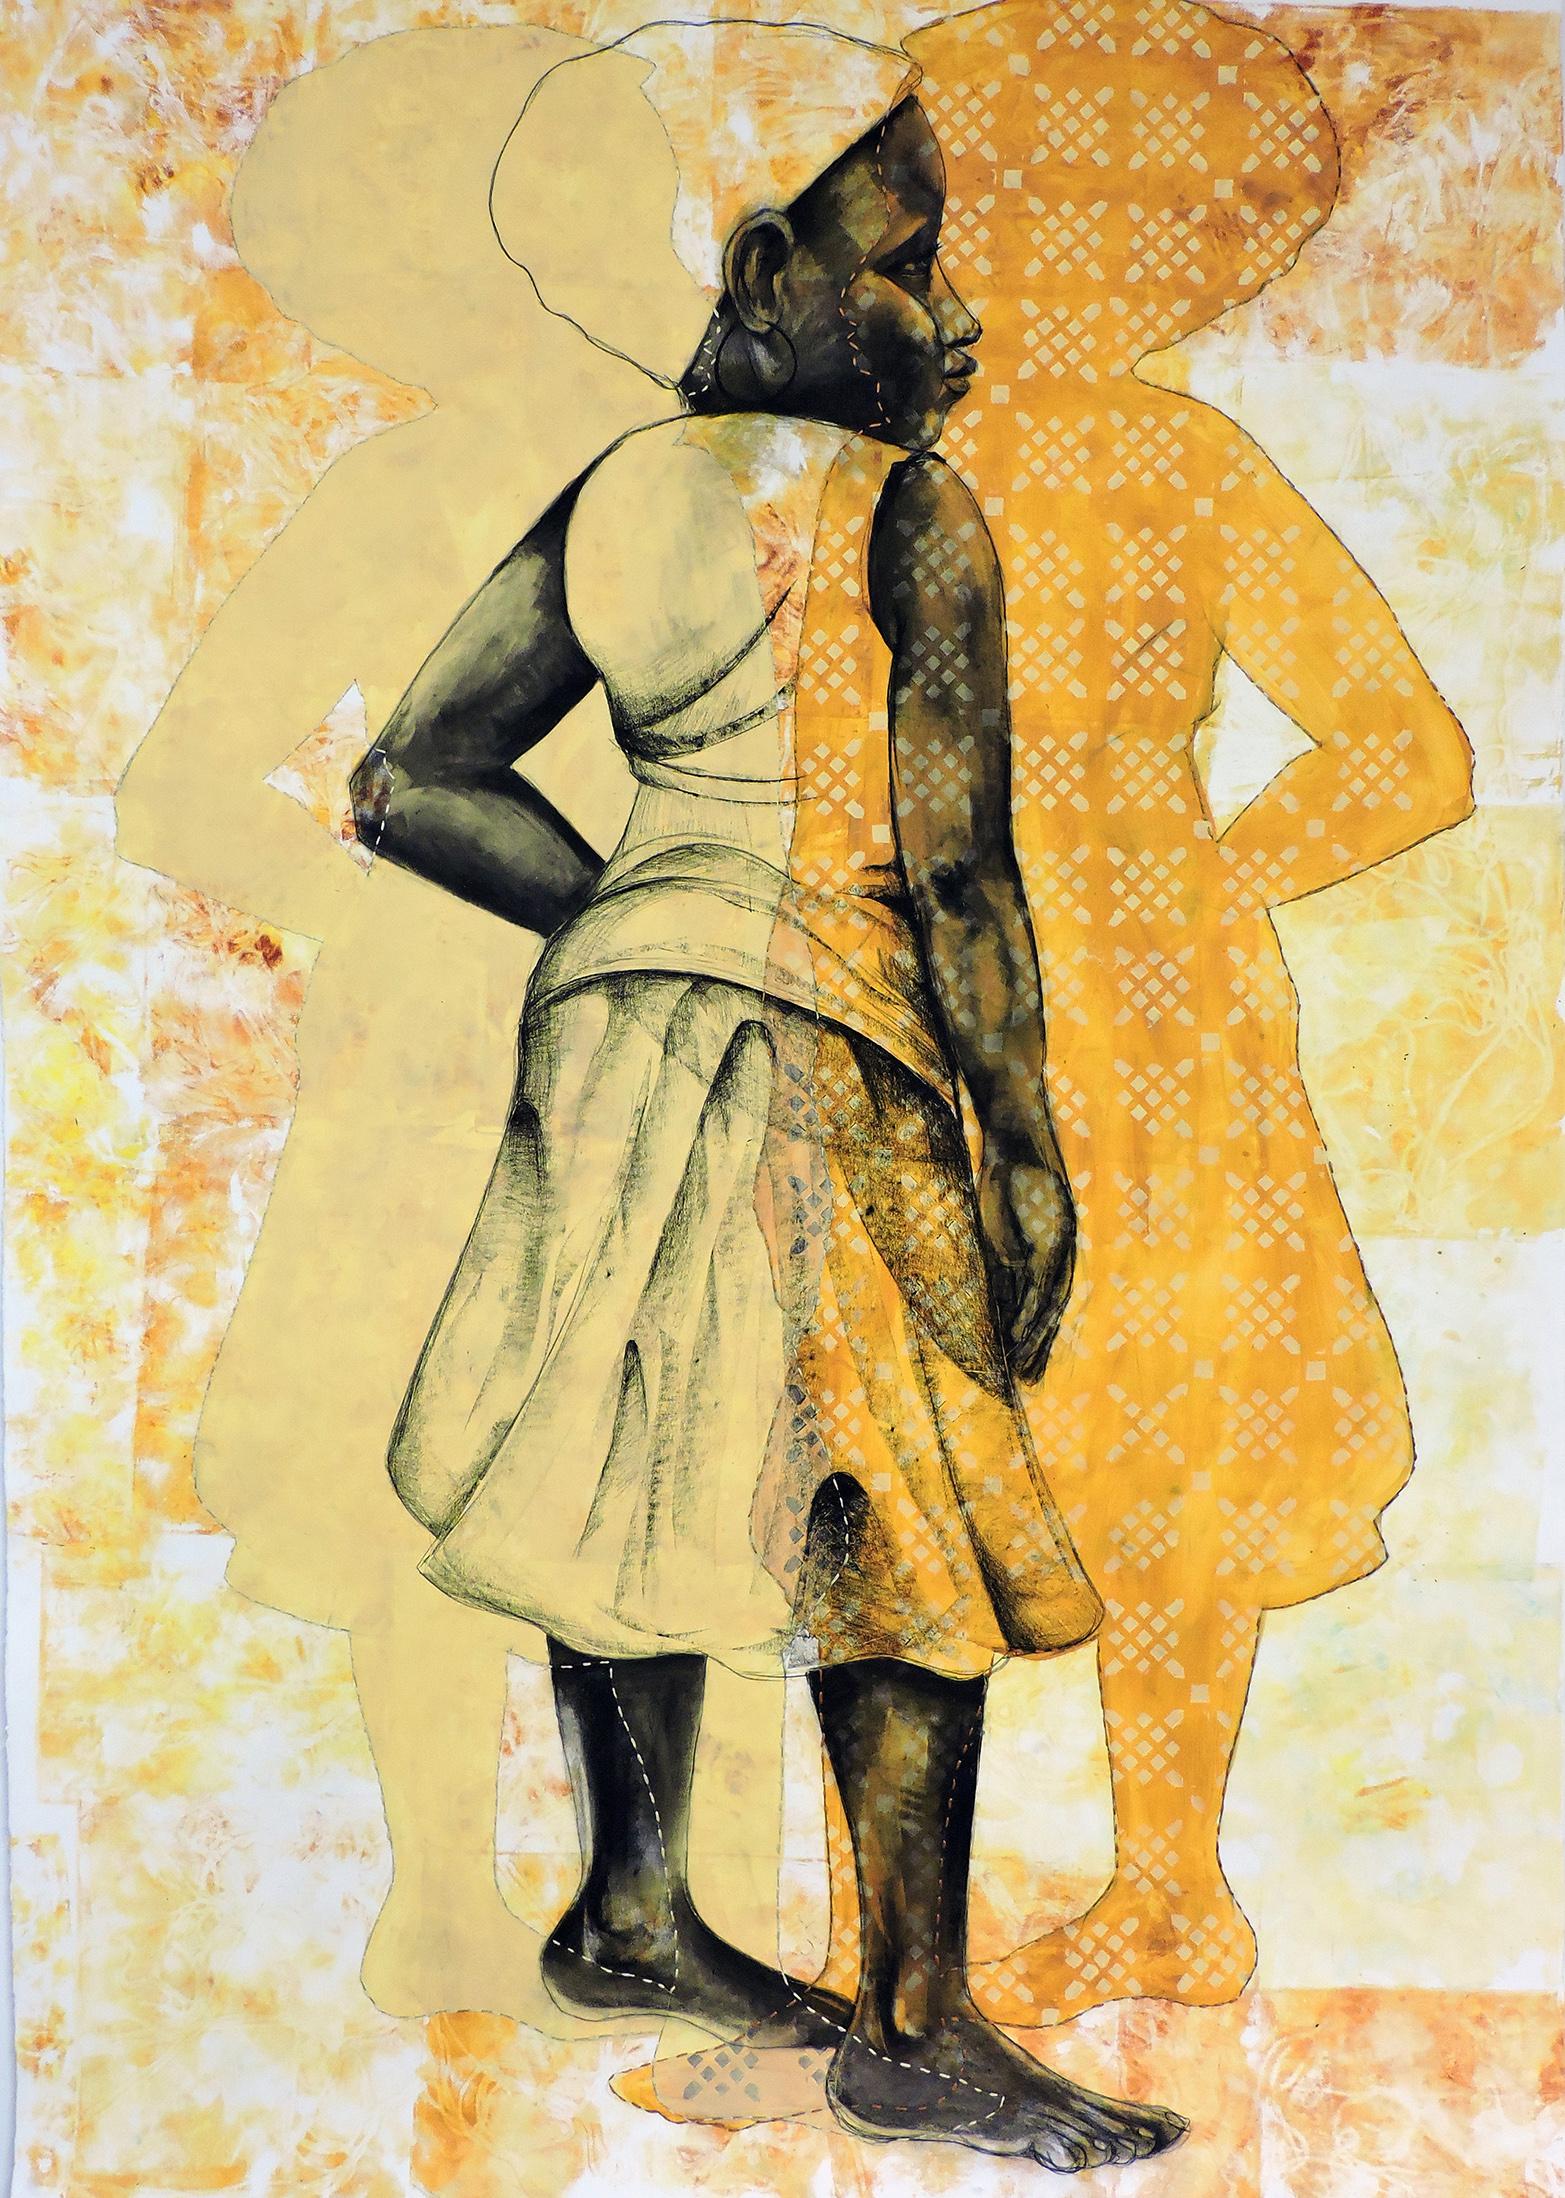 'The Women Gathered,' Gelatin Printing, Conte, Acrylic, Hand-stitching, 51.5 x 74.5, 2015; (Martin)